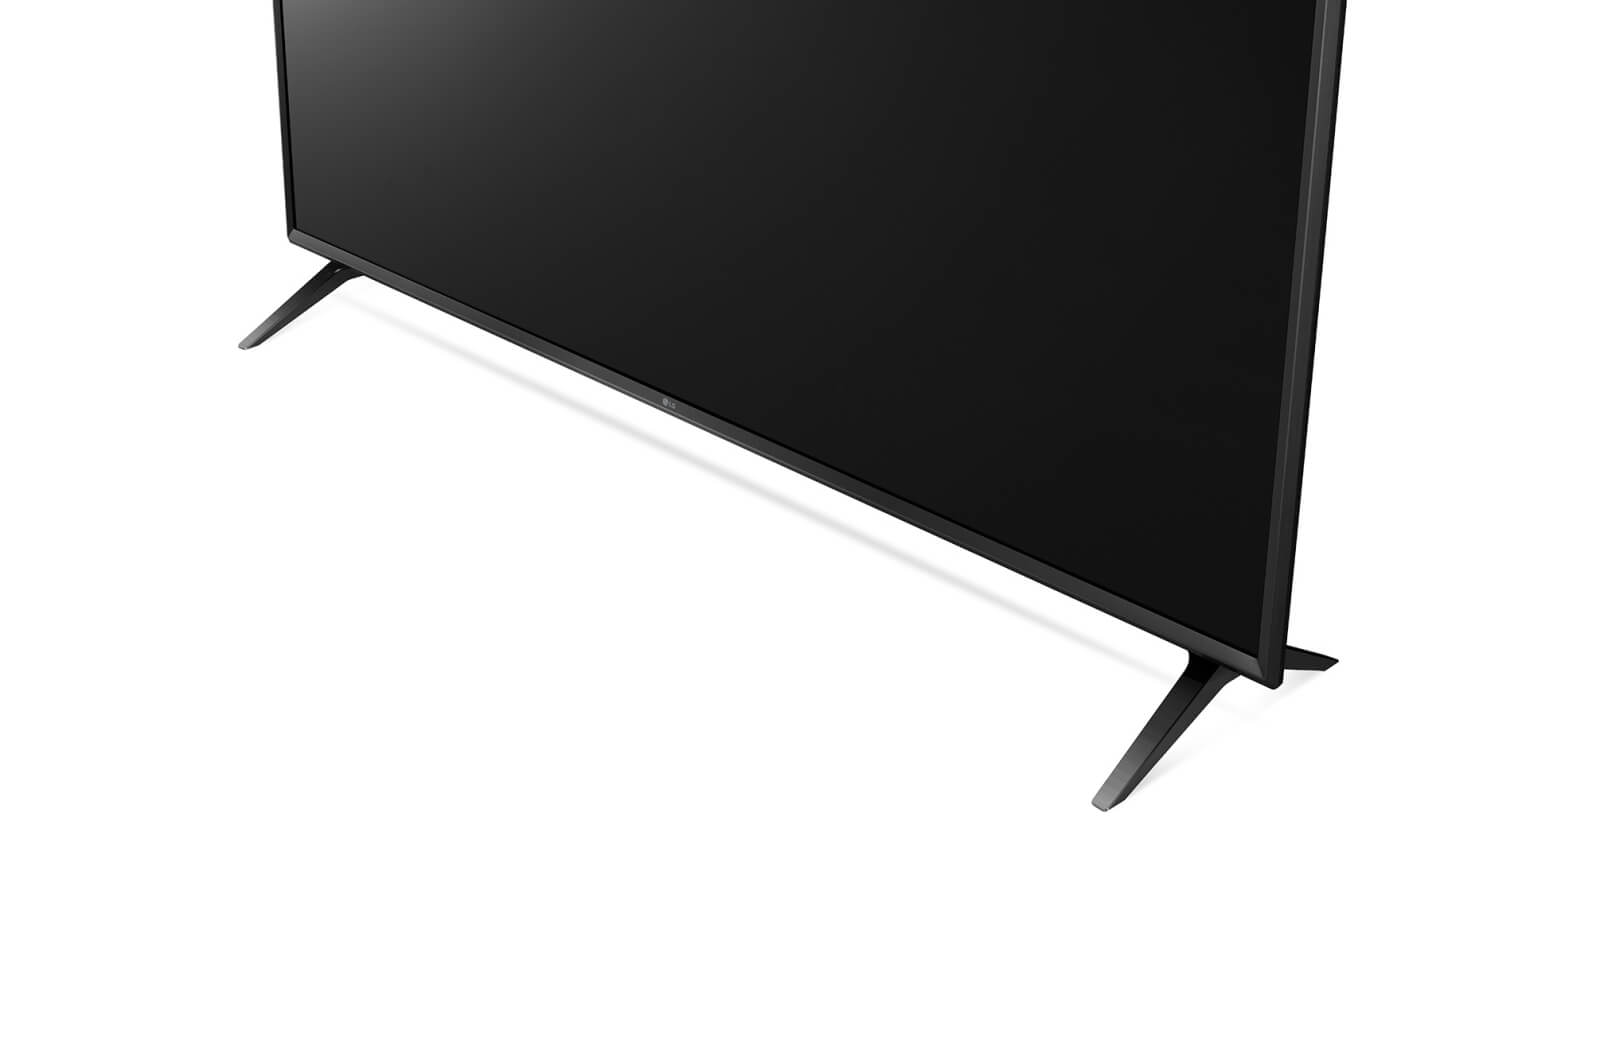 LG UK6300 Built in speakers